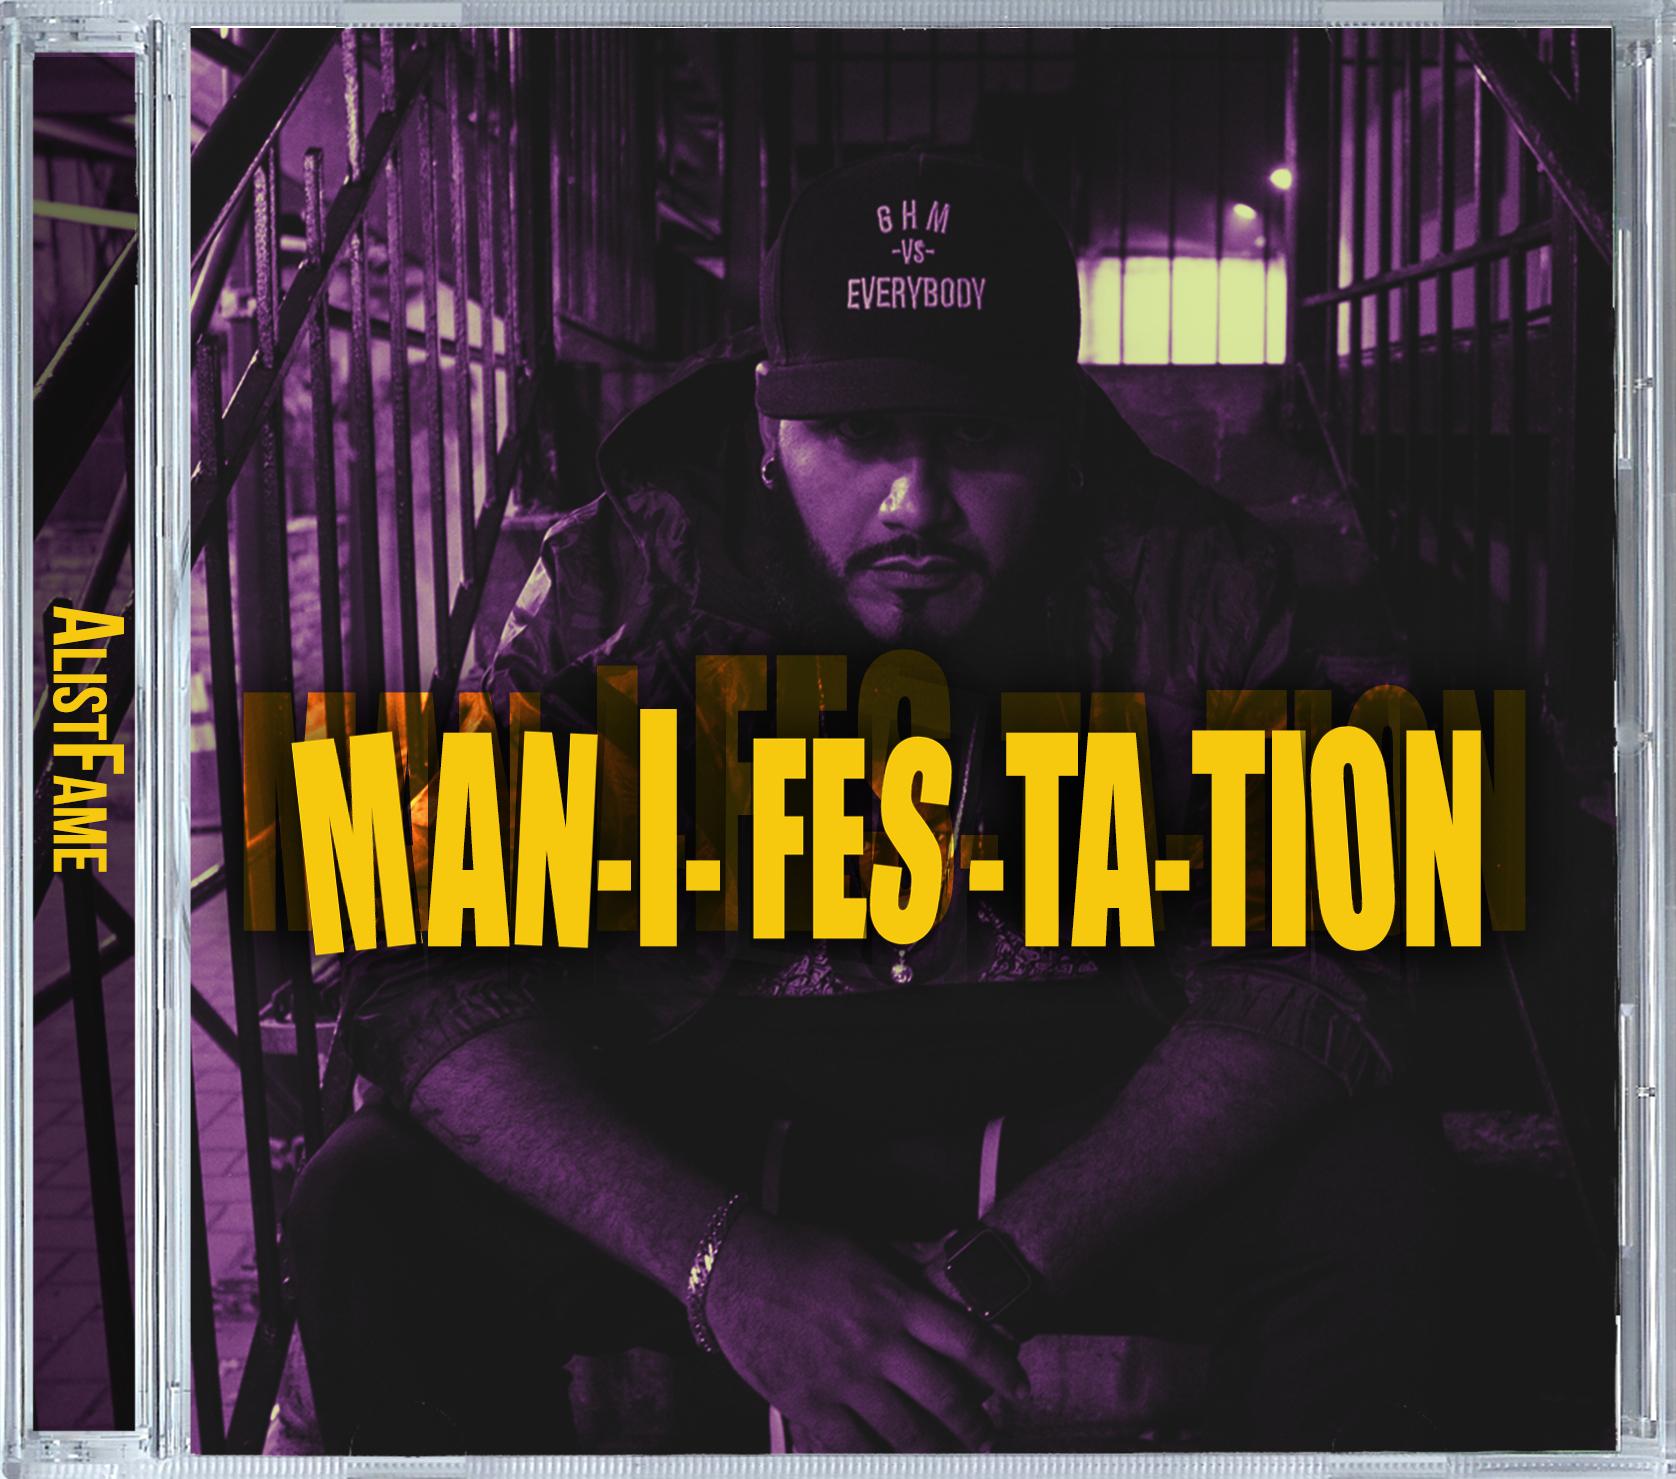 New Music: AlistFame – MAN·I·FES·TA·TION (LP)